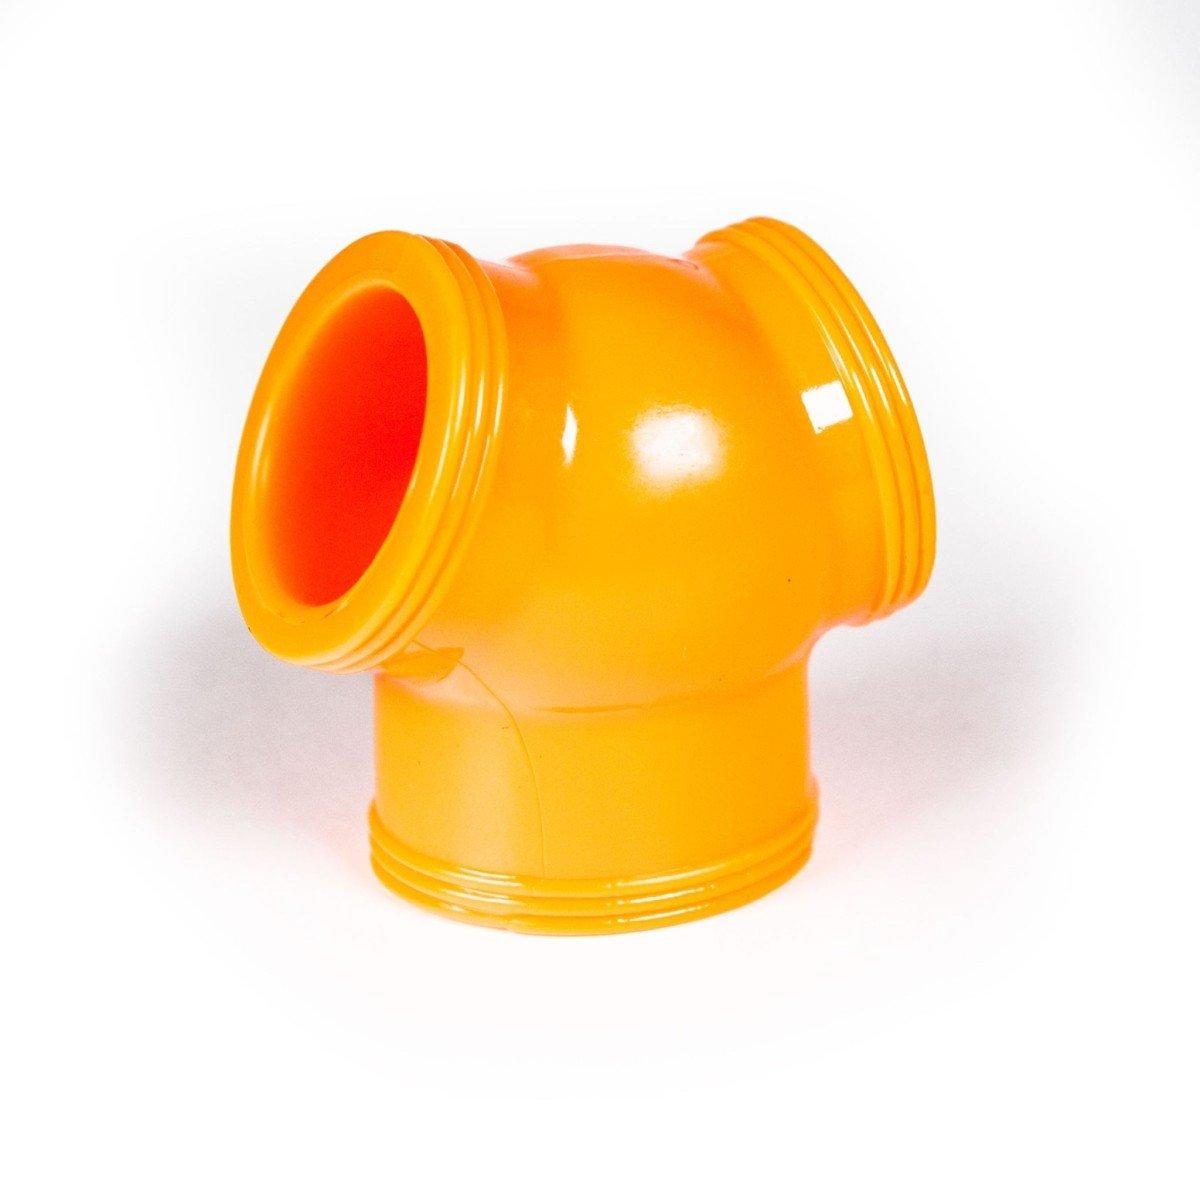 Zizi Megamen Cocksling Cock Ring & Ball Stretcher Fluo Orange